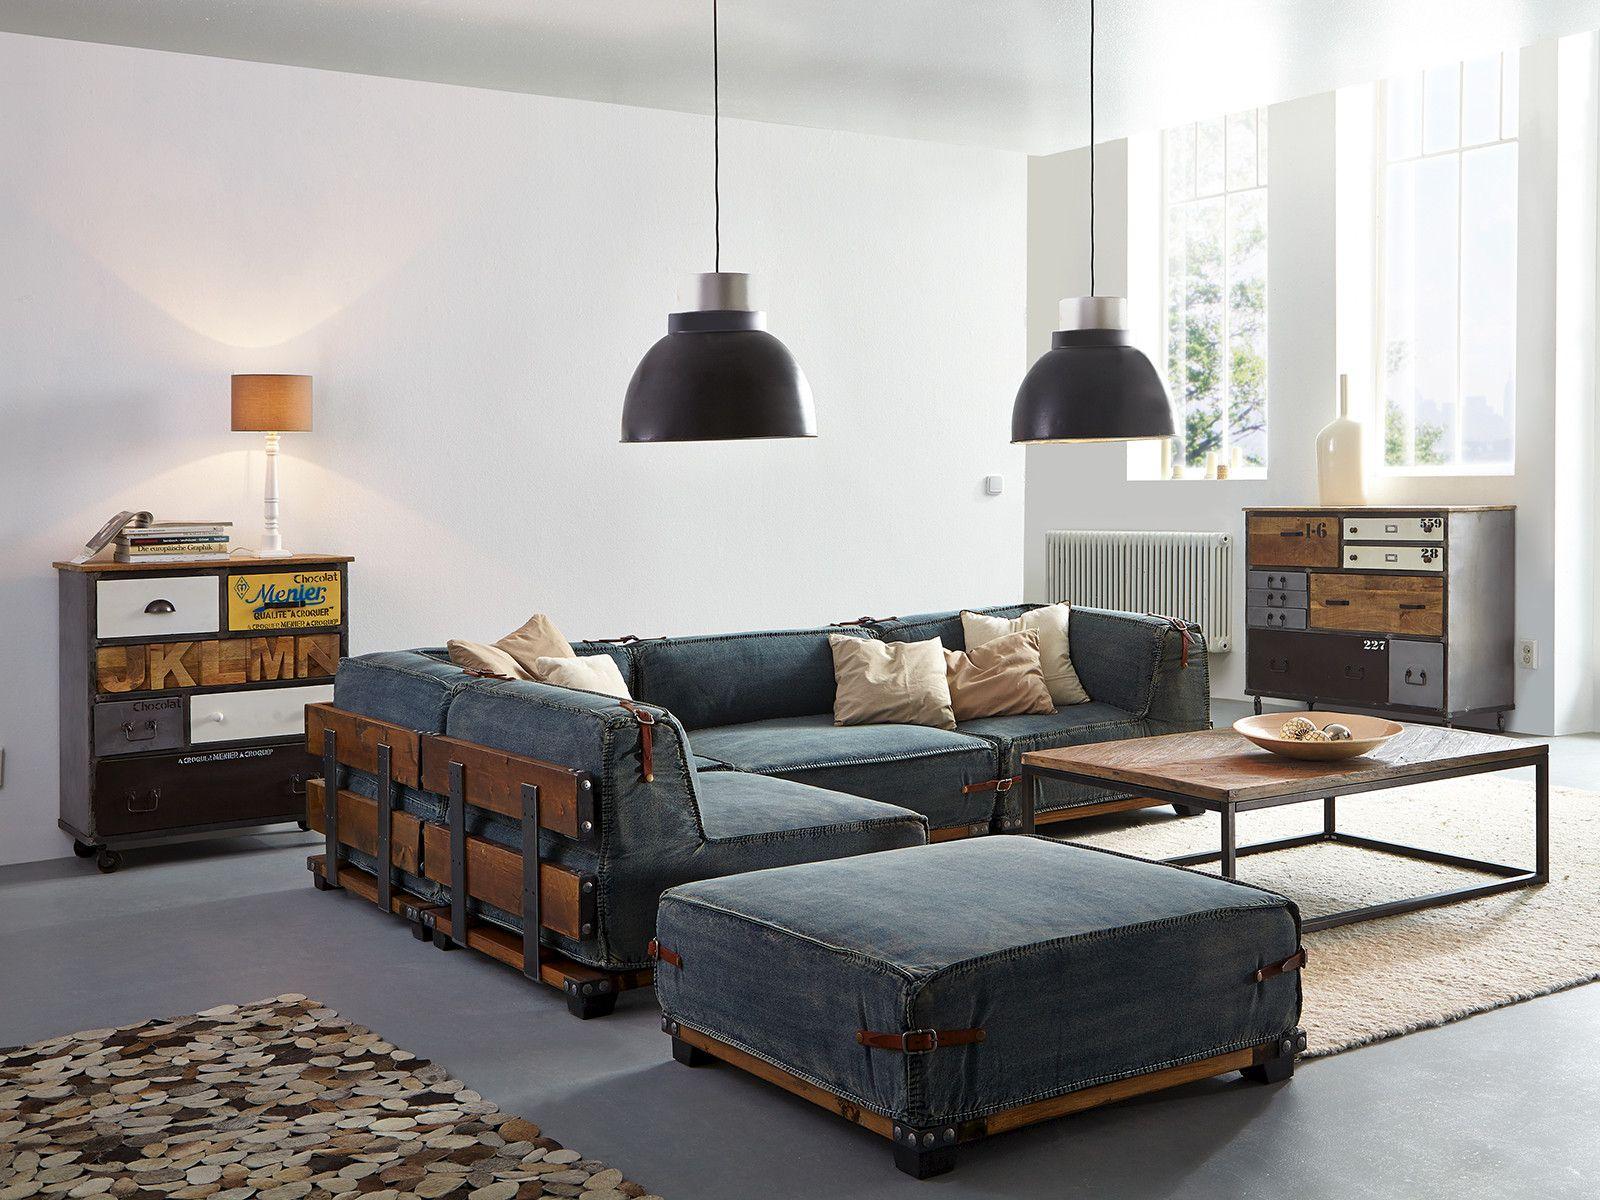 Wohnzimmer Hocker ~ Rercyceltem jeansstoff hartholzgestell metallapplikationen hocker